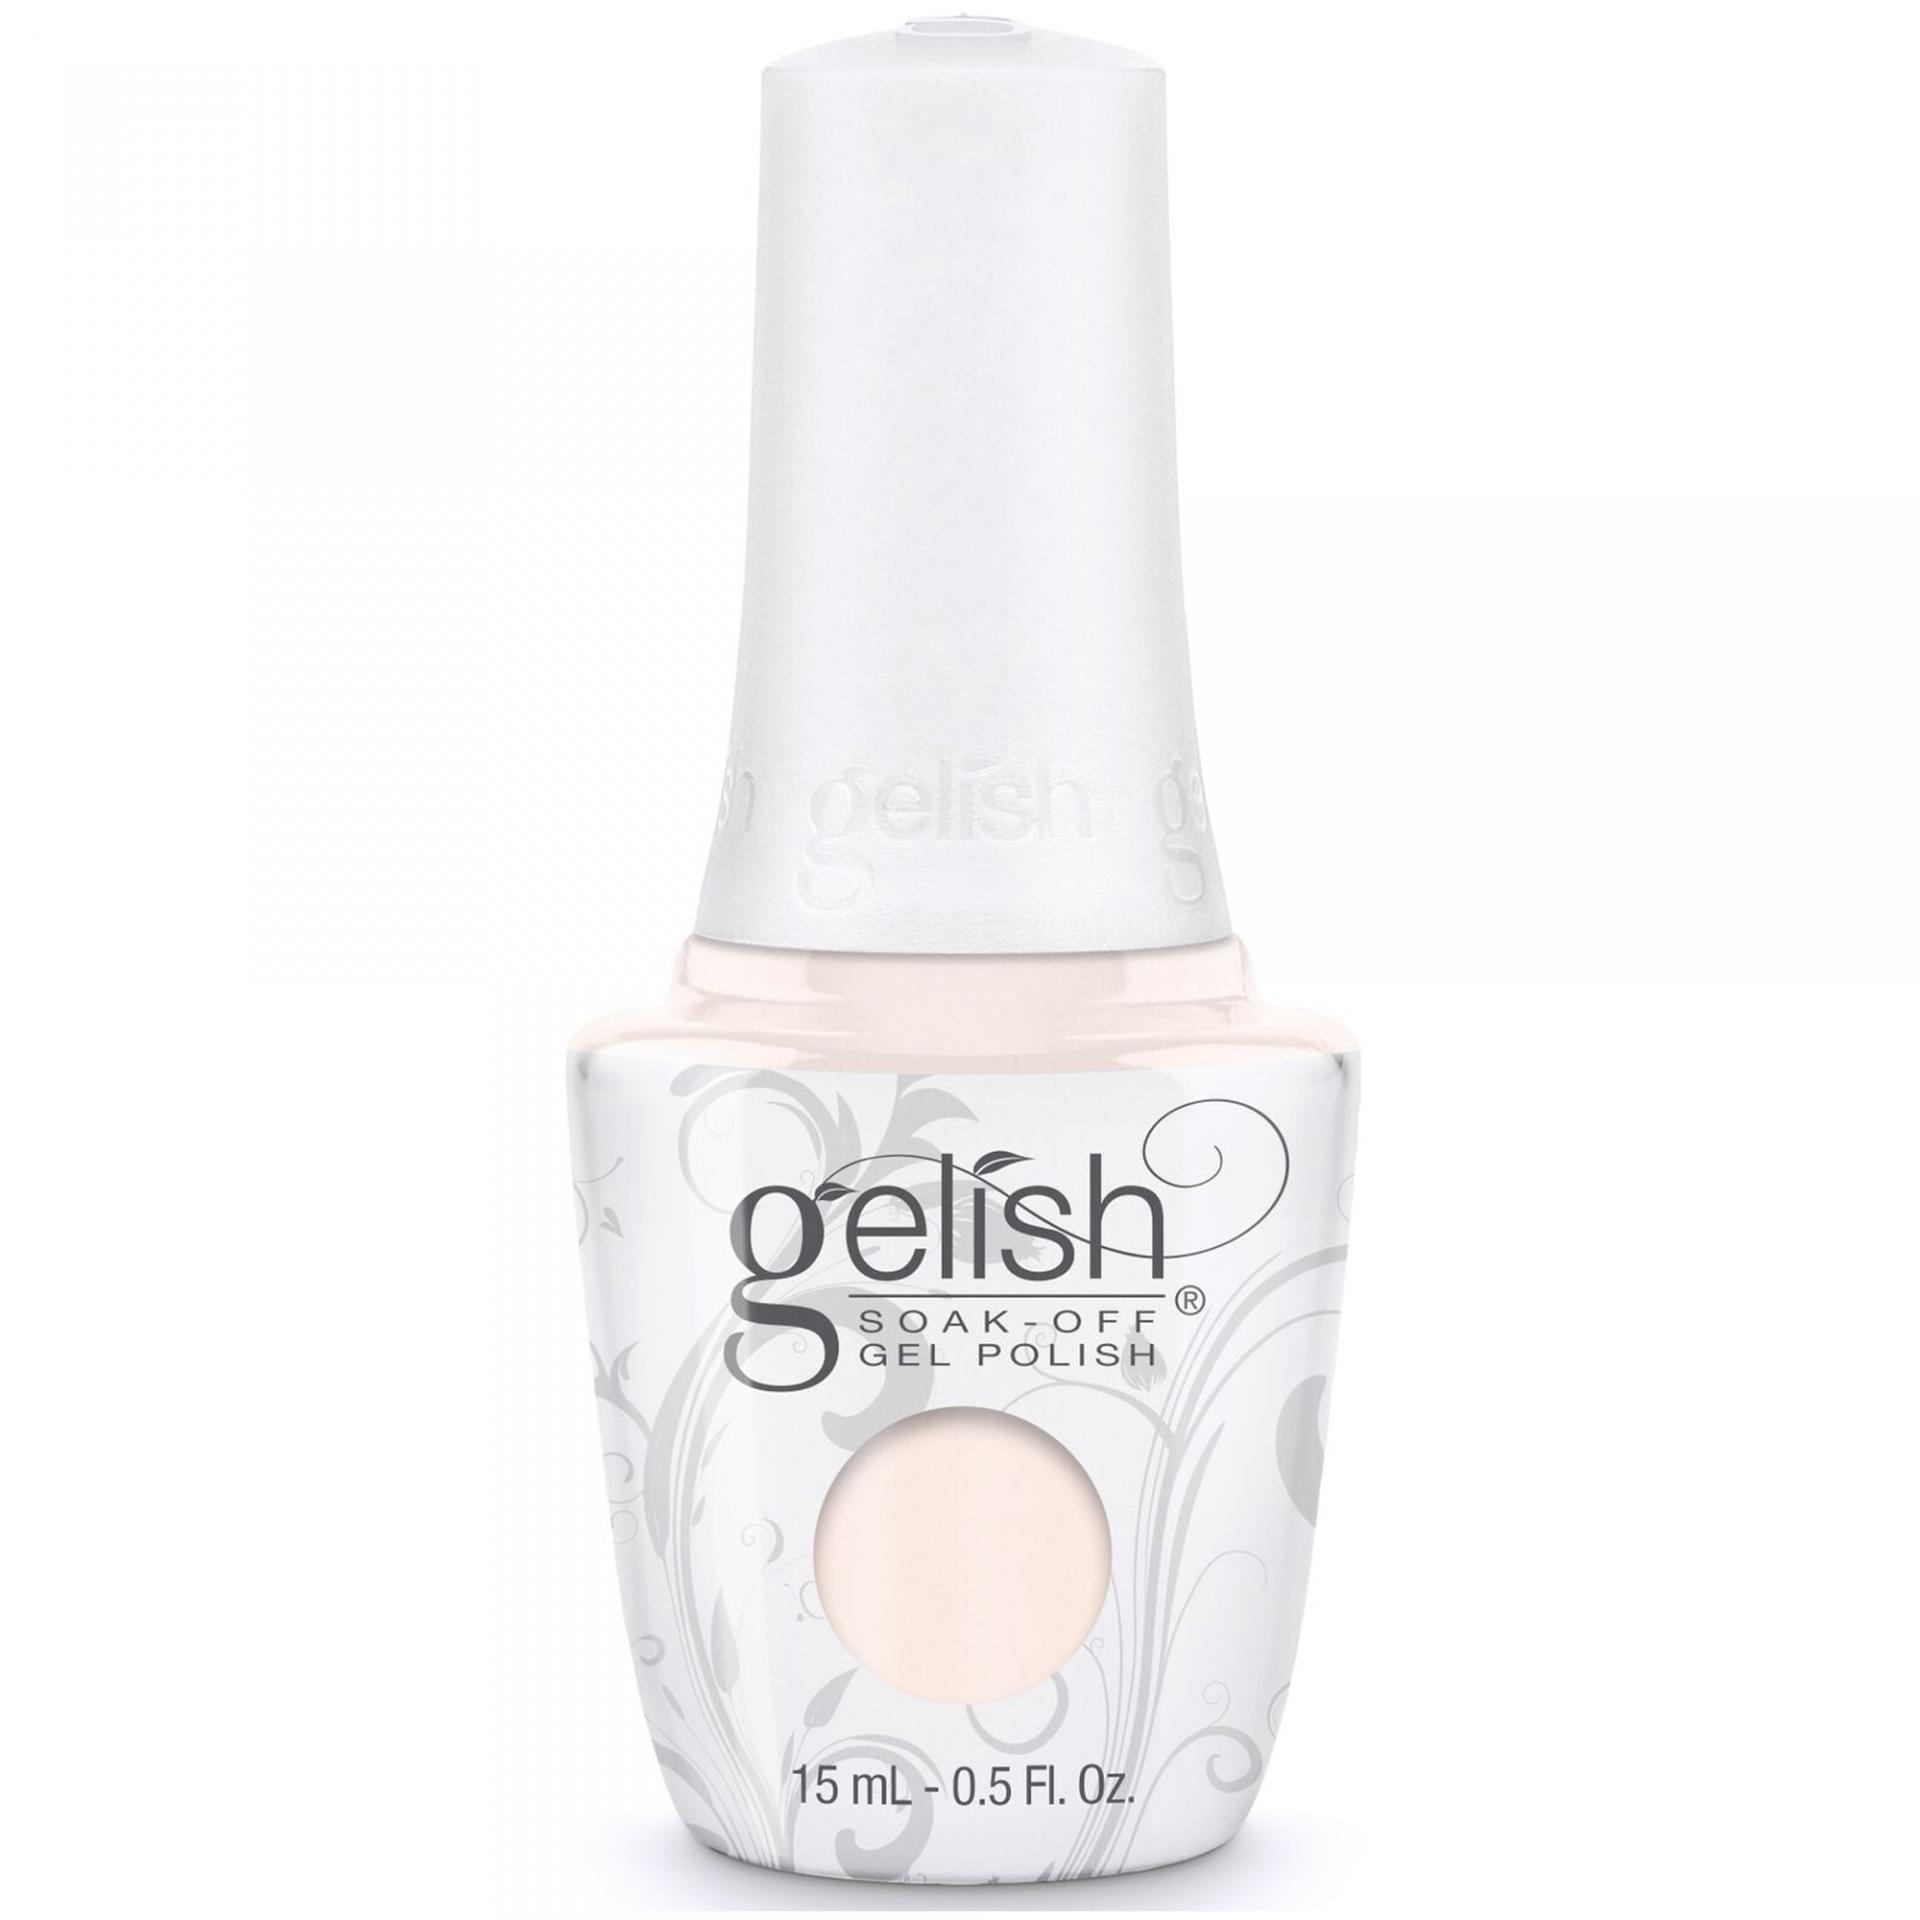 Gelish my main freeze 2